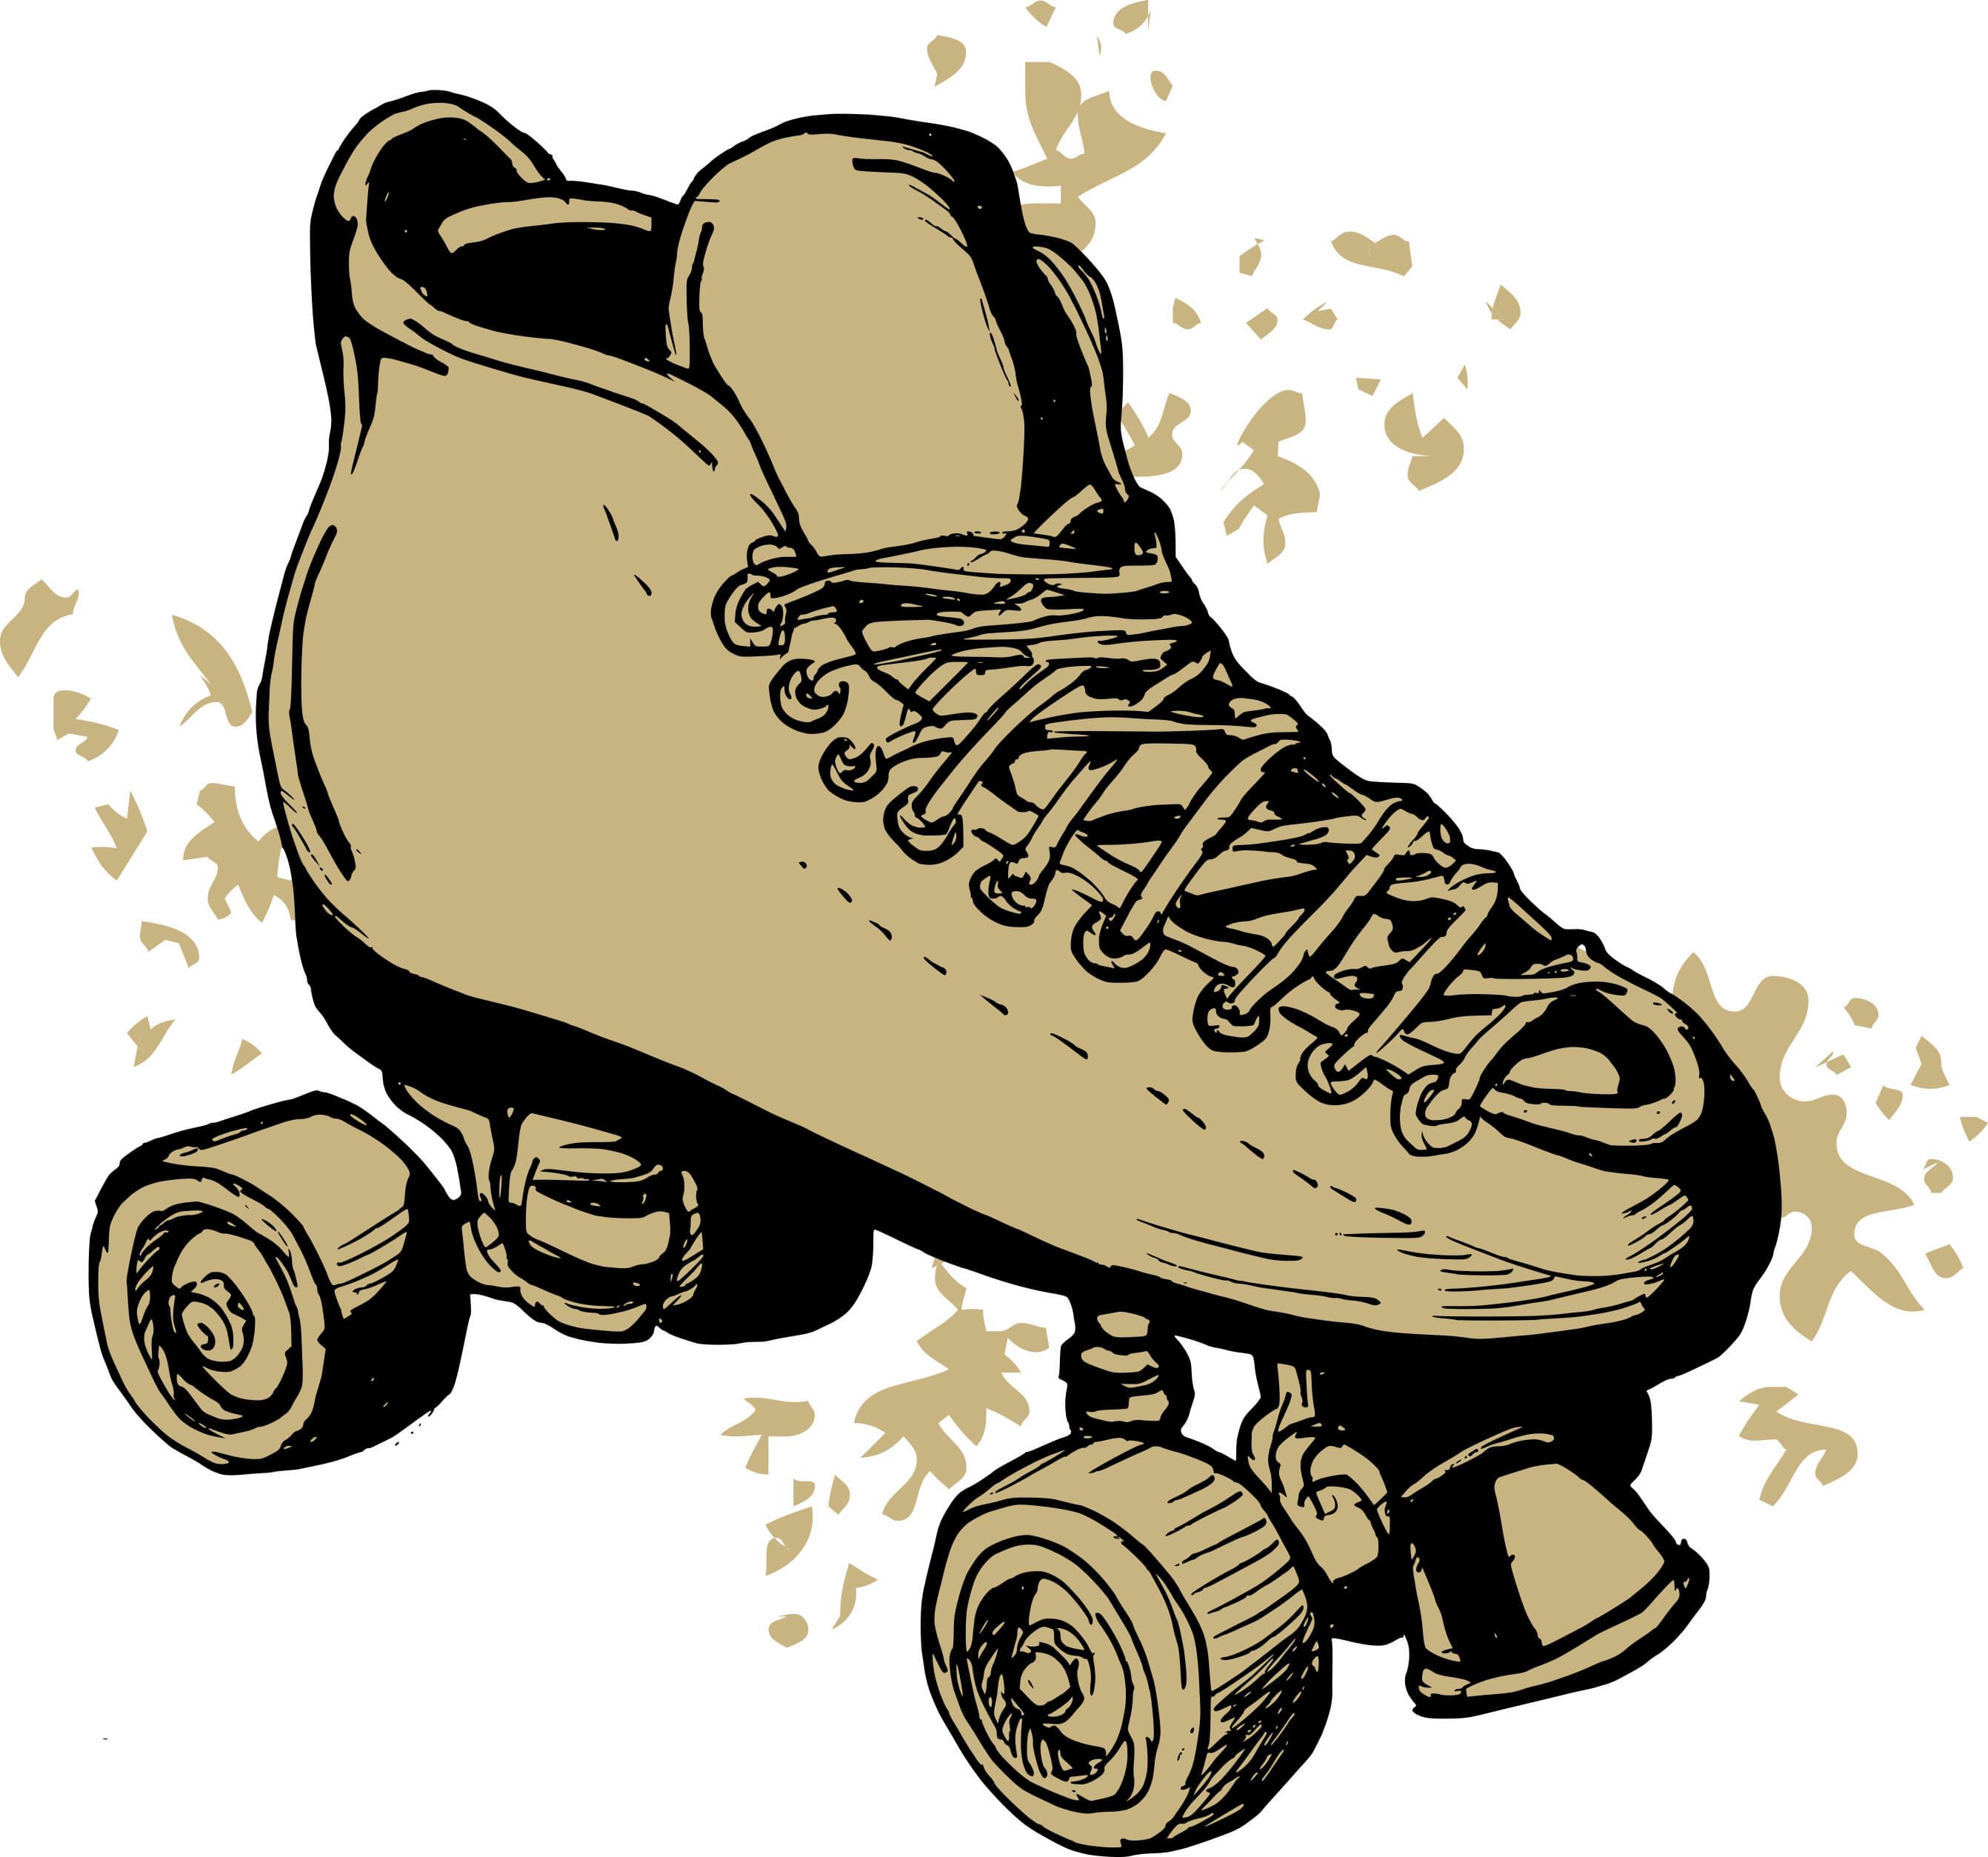 Roller skates under 20 dollars - How To Care For Roller Skates